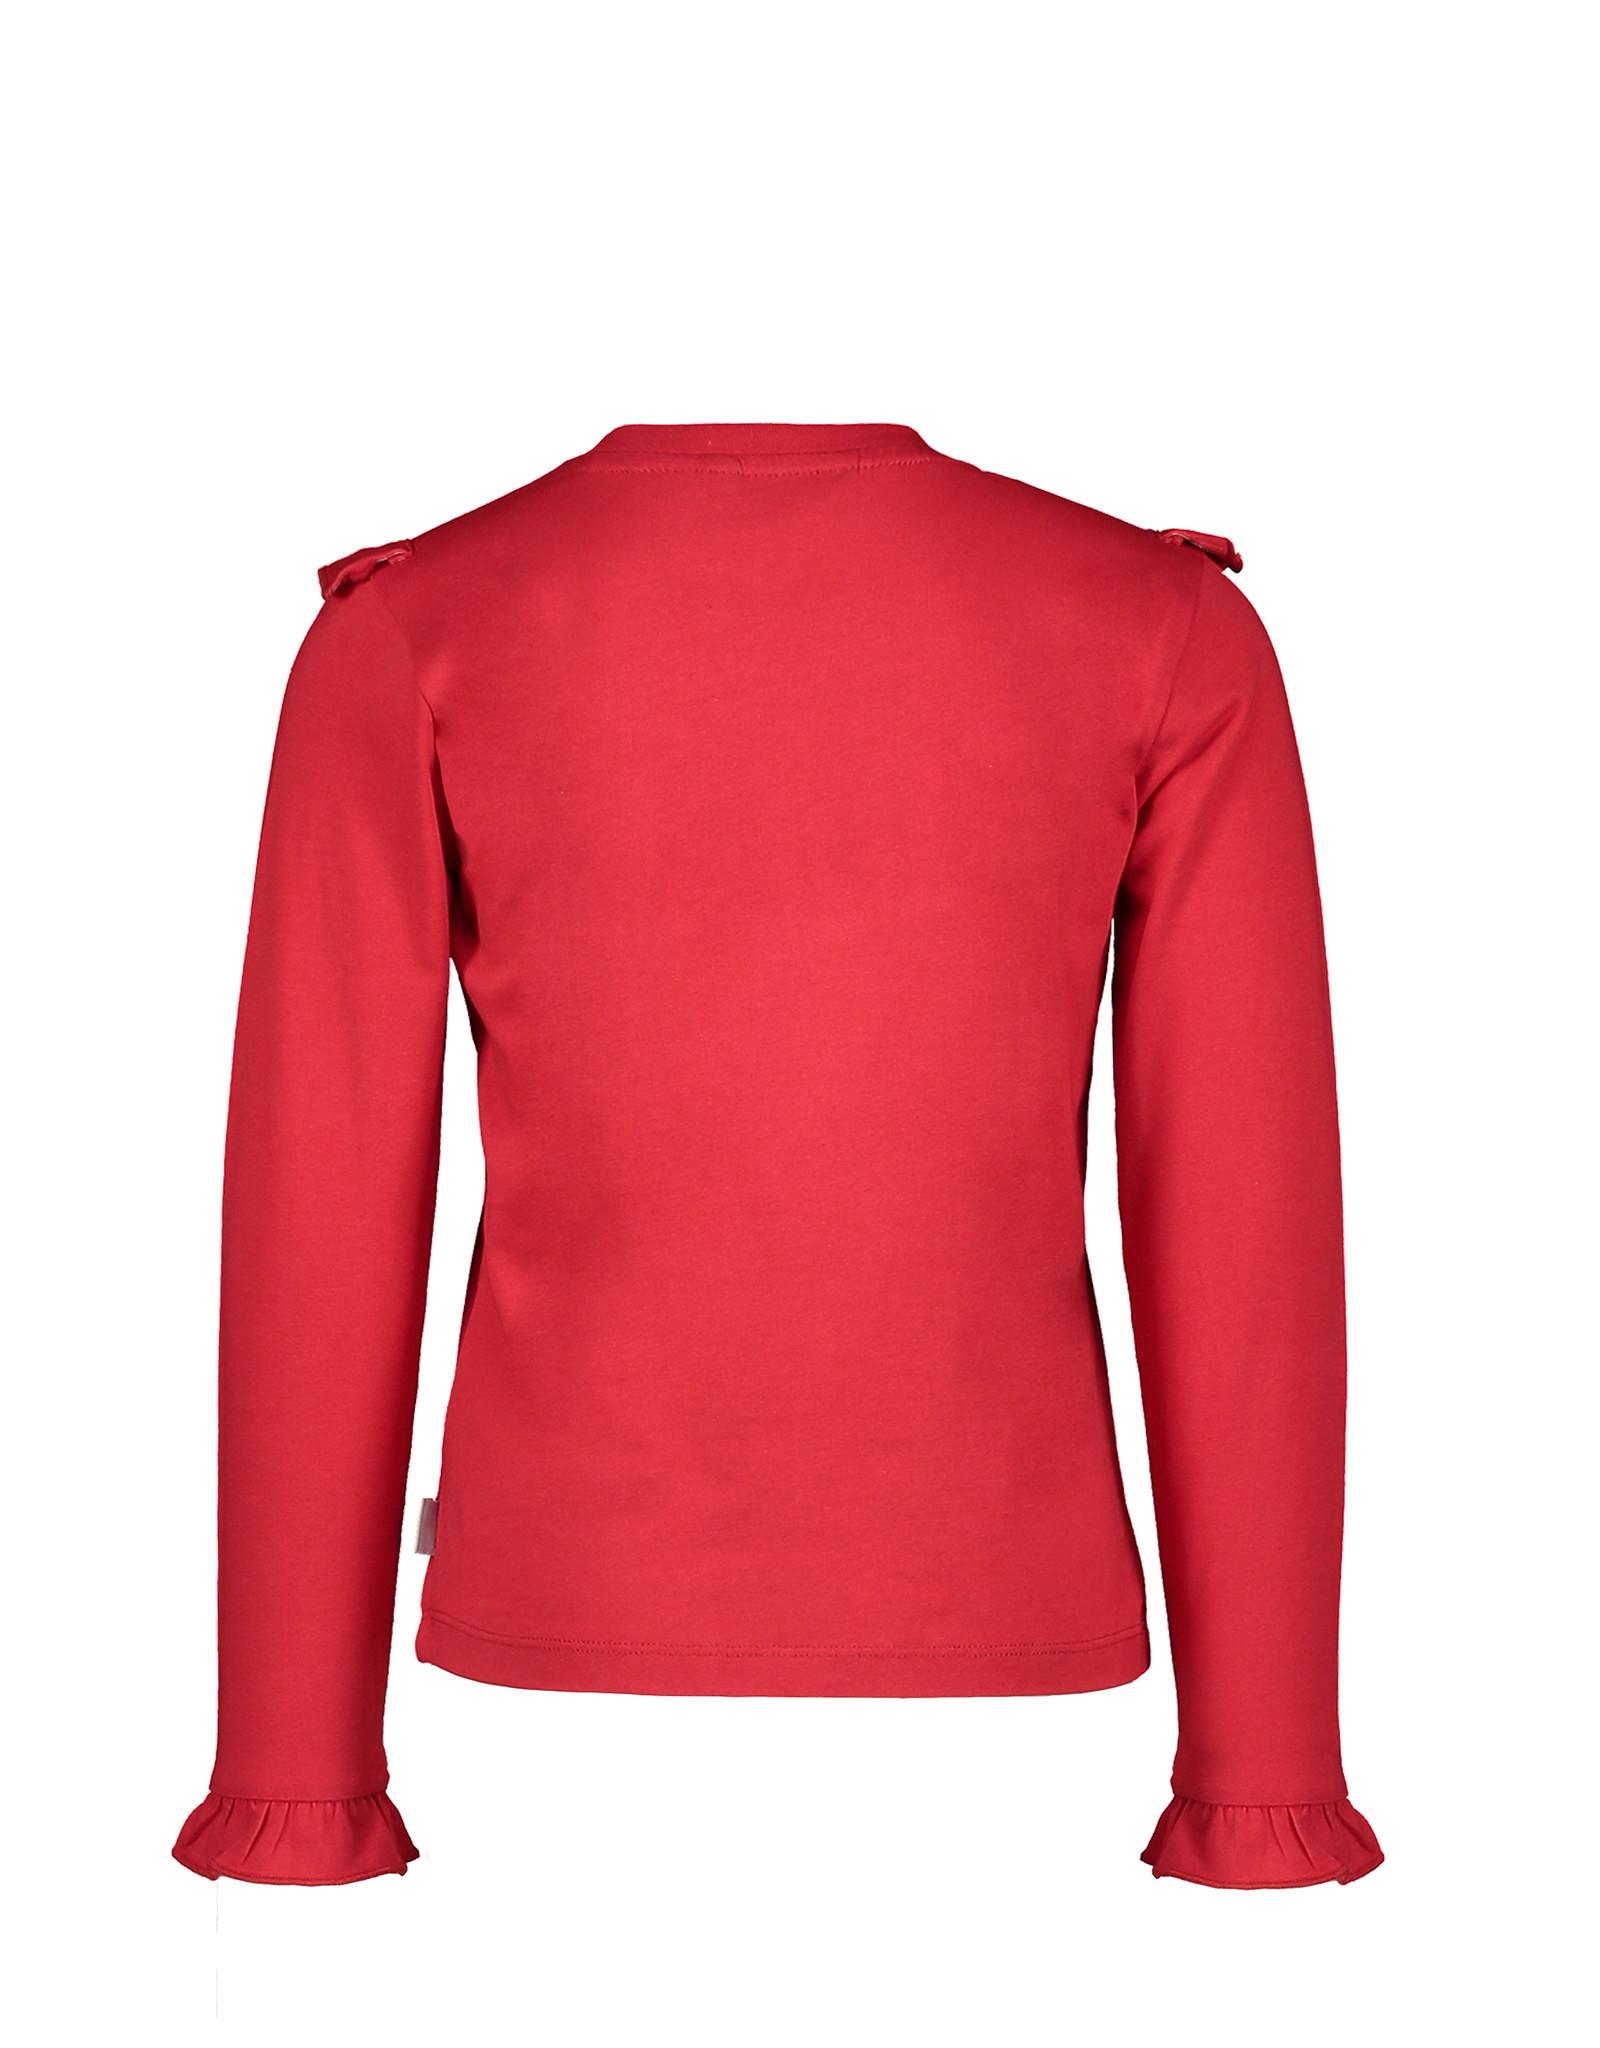 Moodstreet Moodstreet shirt 5404 red